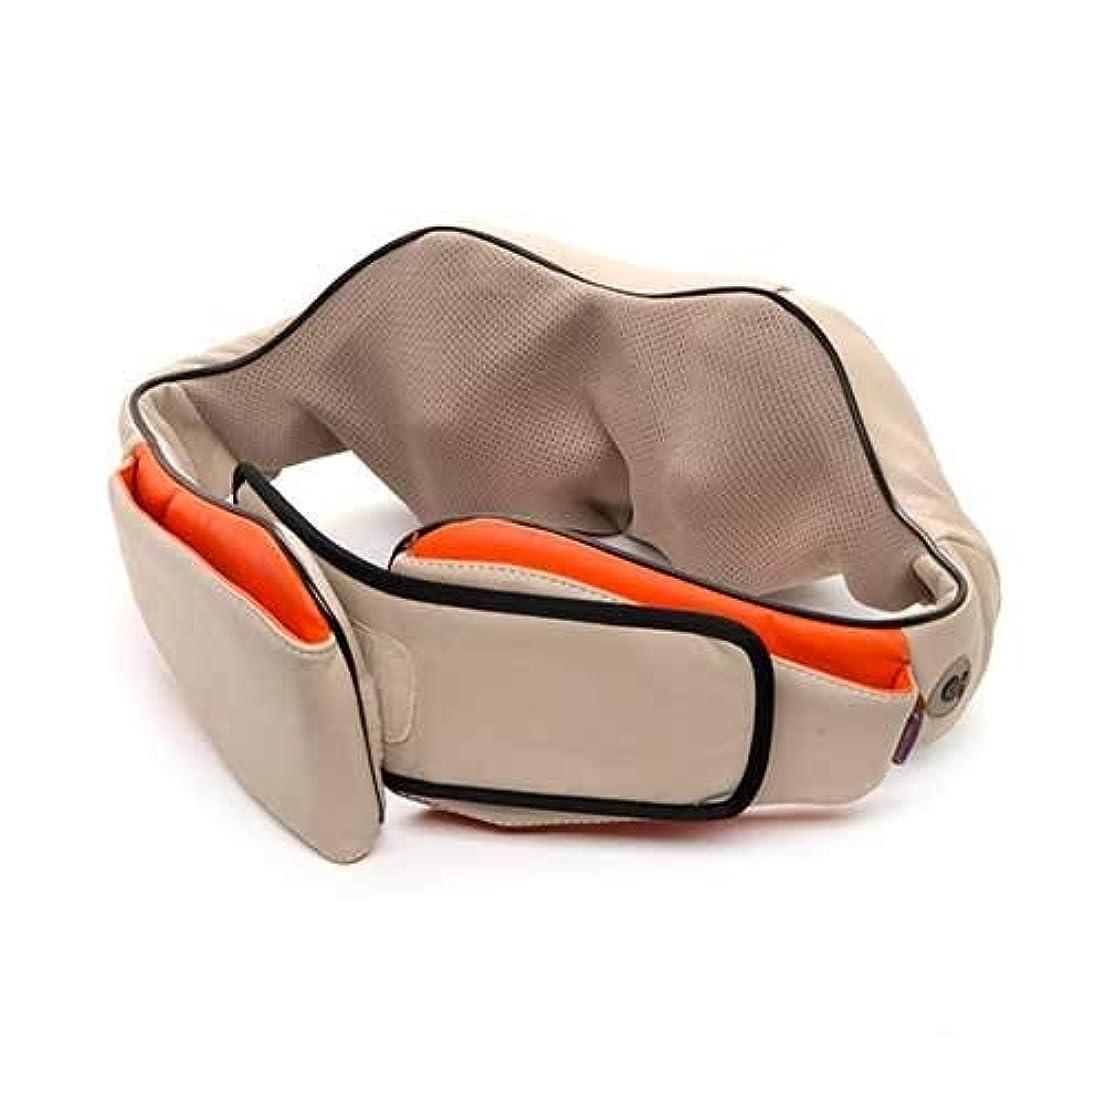 Relaxus Shiatsu Kneader Neck And Body Wireless Wrap Massager 141[並行輸入]